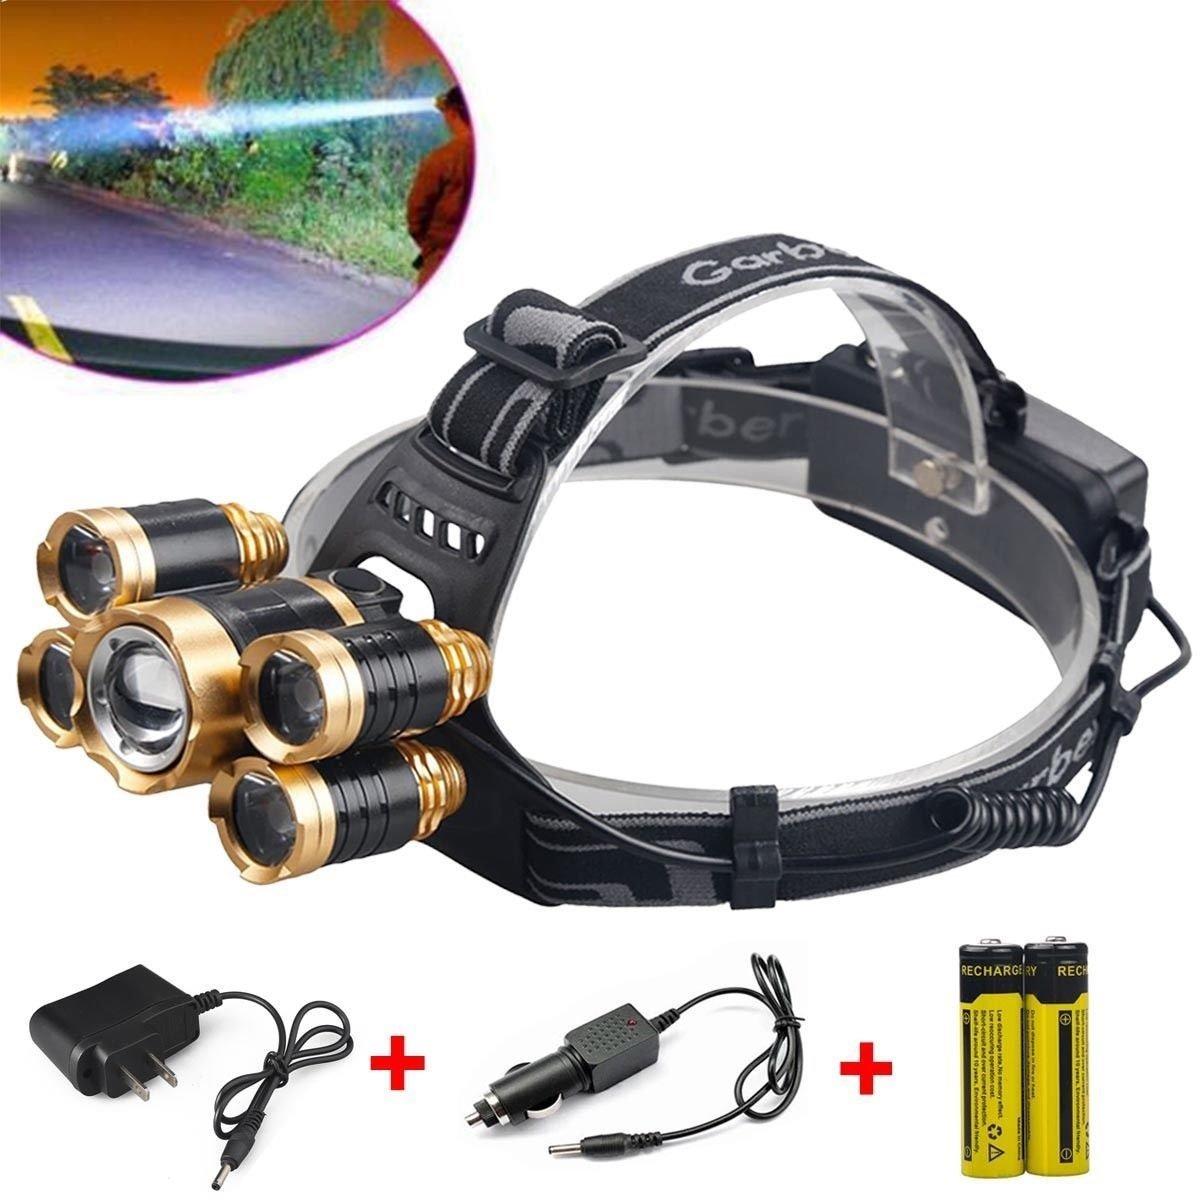 80,000Lumens 5x XM-L T6 LED Rechargeable 18650 Headlamp Head Light Torch Lamp USA